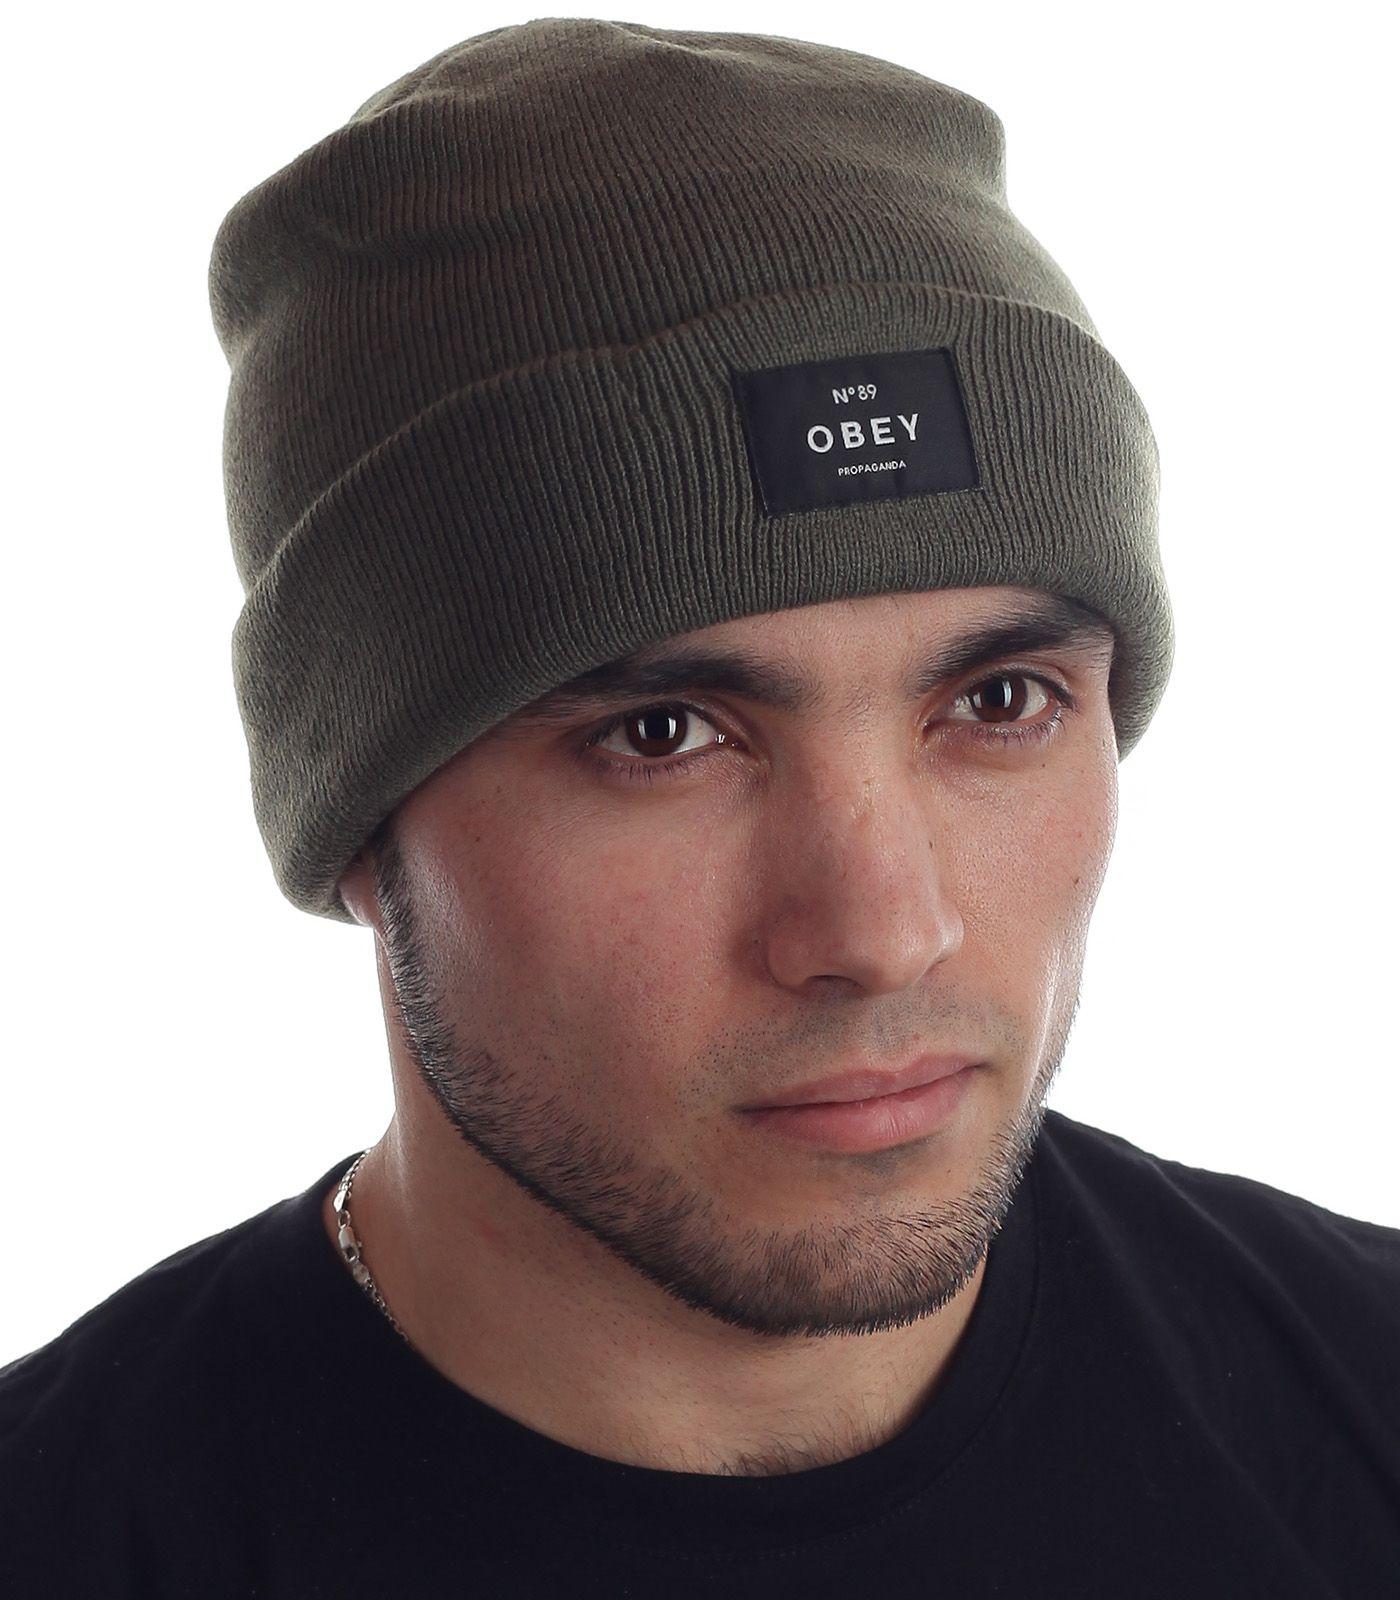 Купить мужскую шапку от OBEY Clothing онлайн